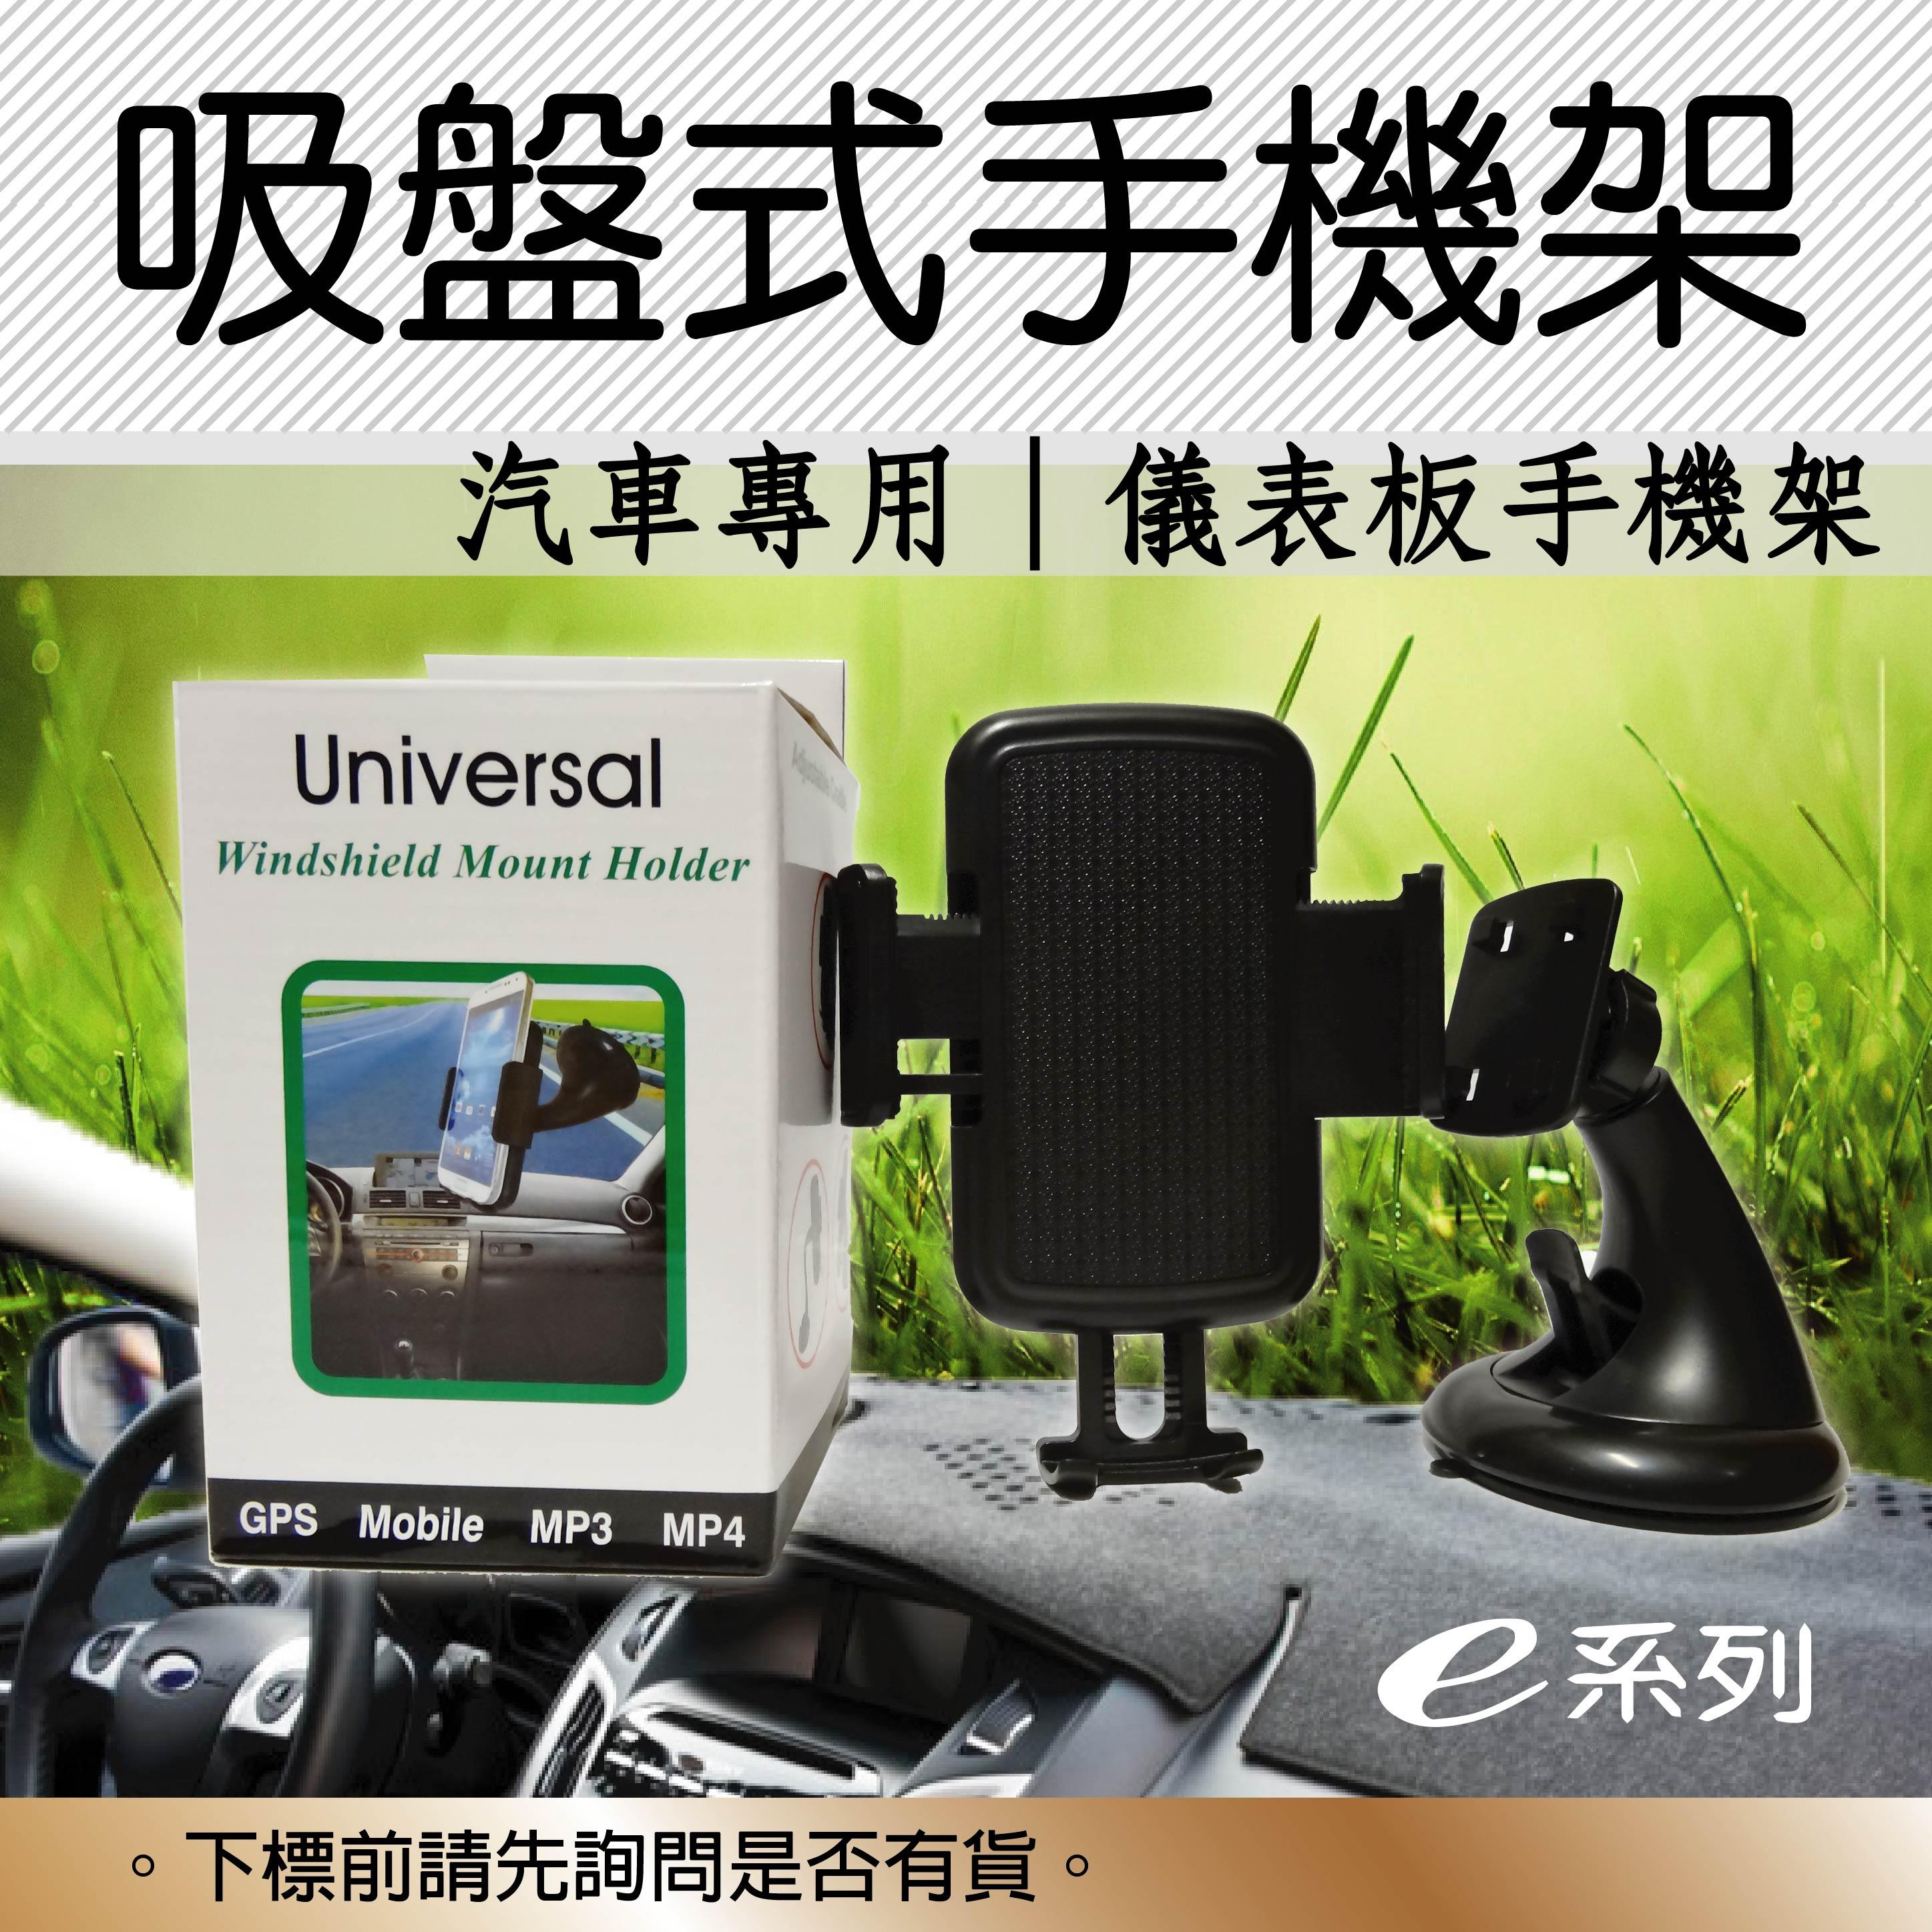 e系列汽車用品吸盤弍手機架